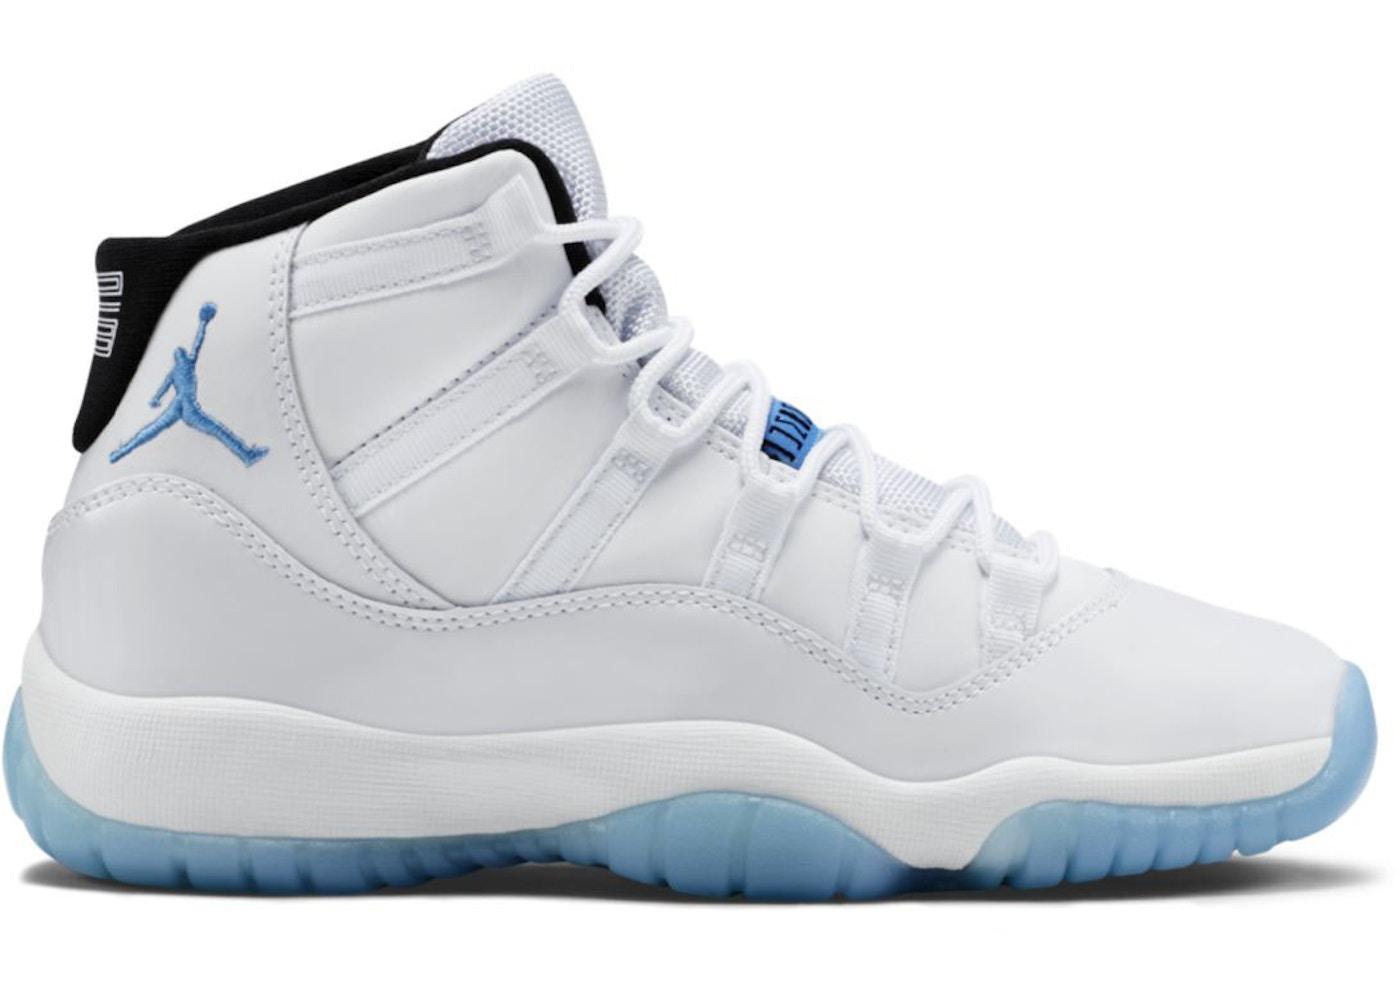 3c94be7525b Jordan 11 Retro Legend Blue 2014 (GS) - 378038-117